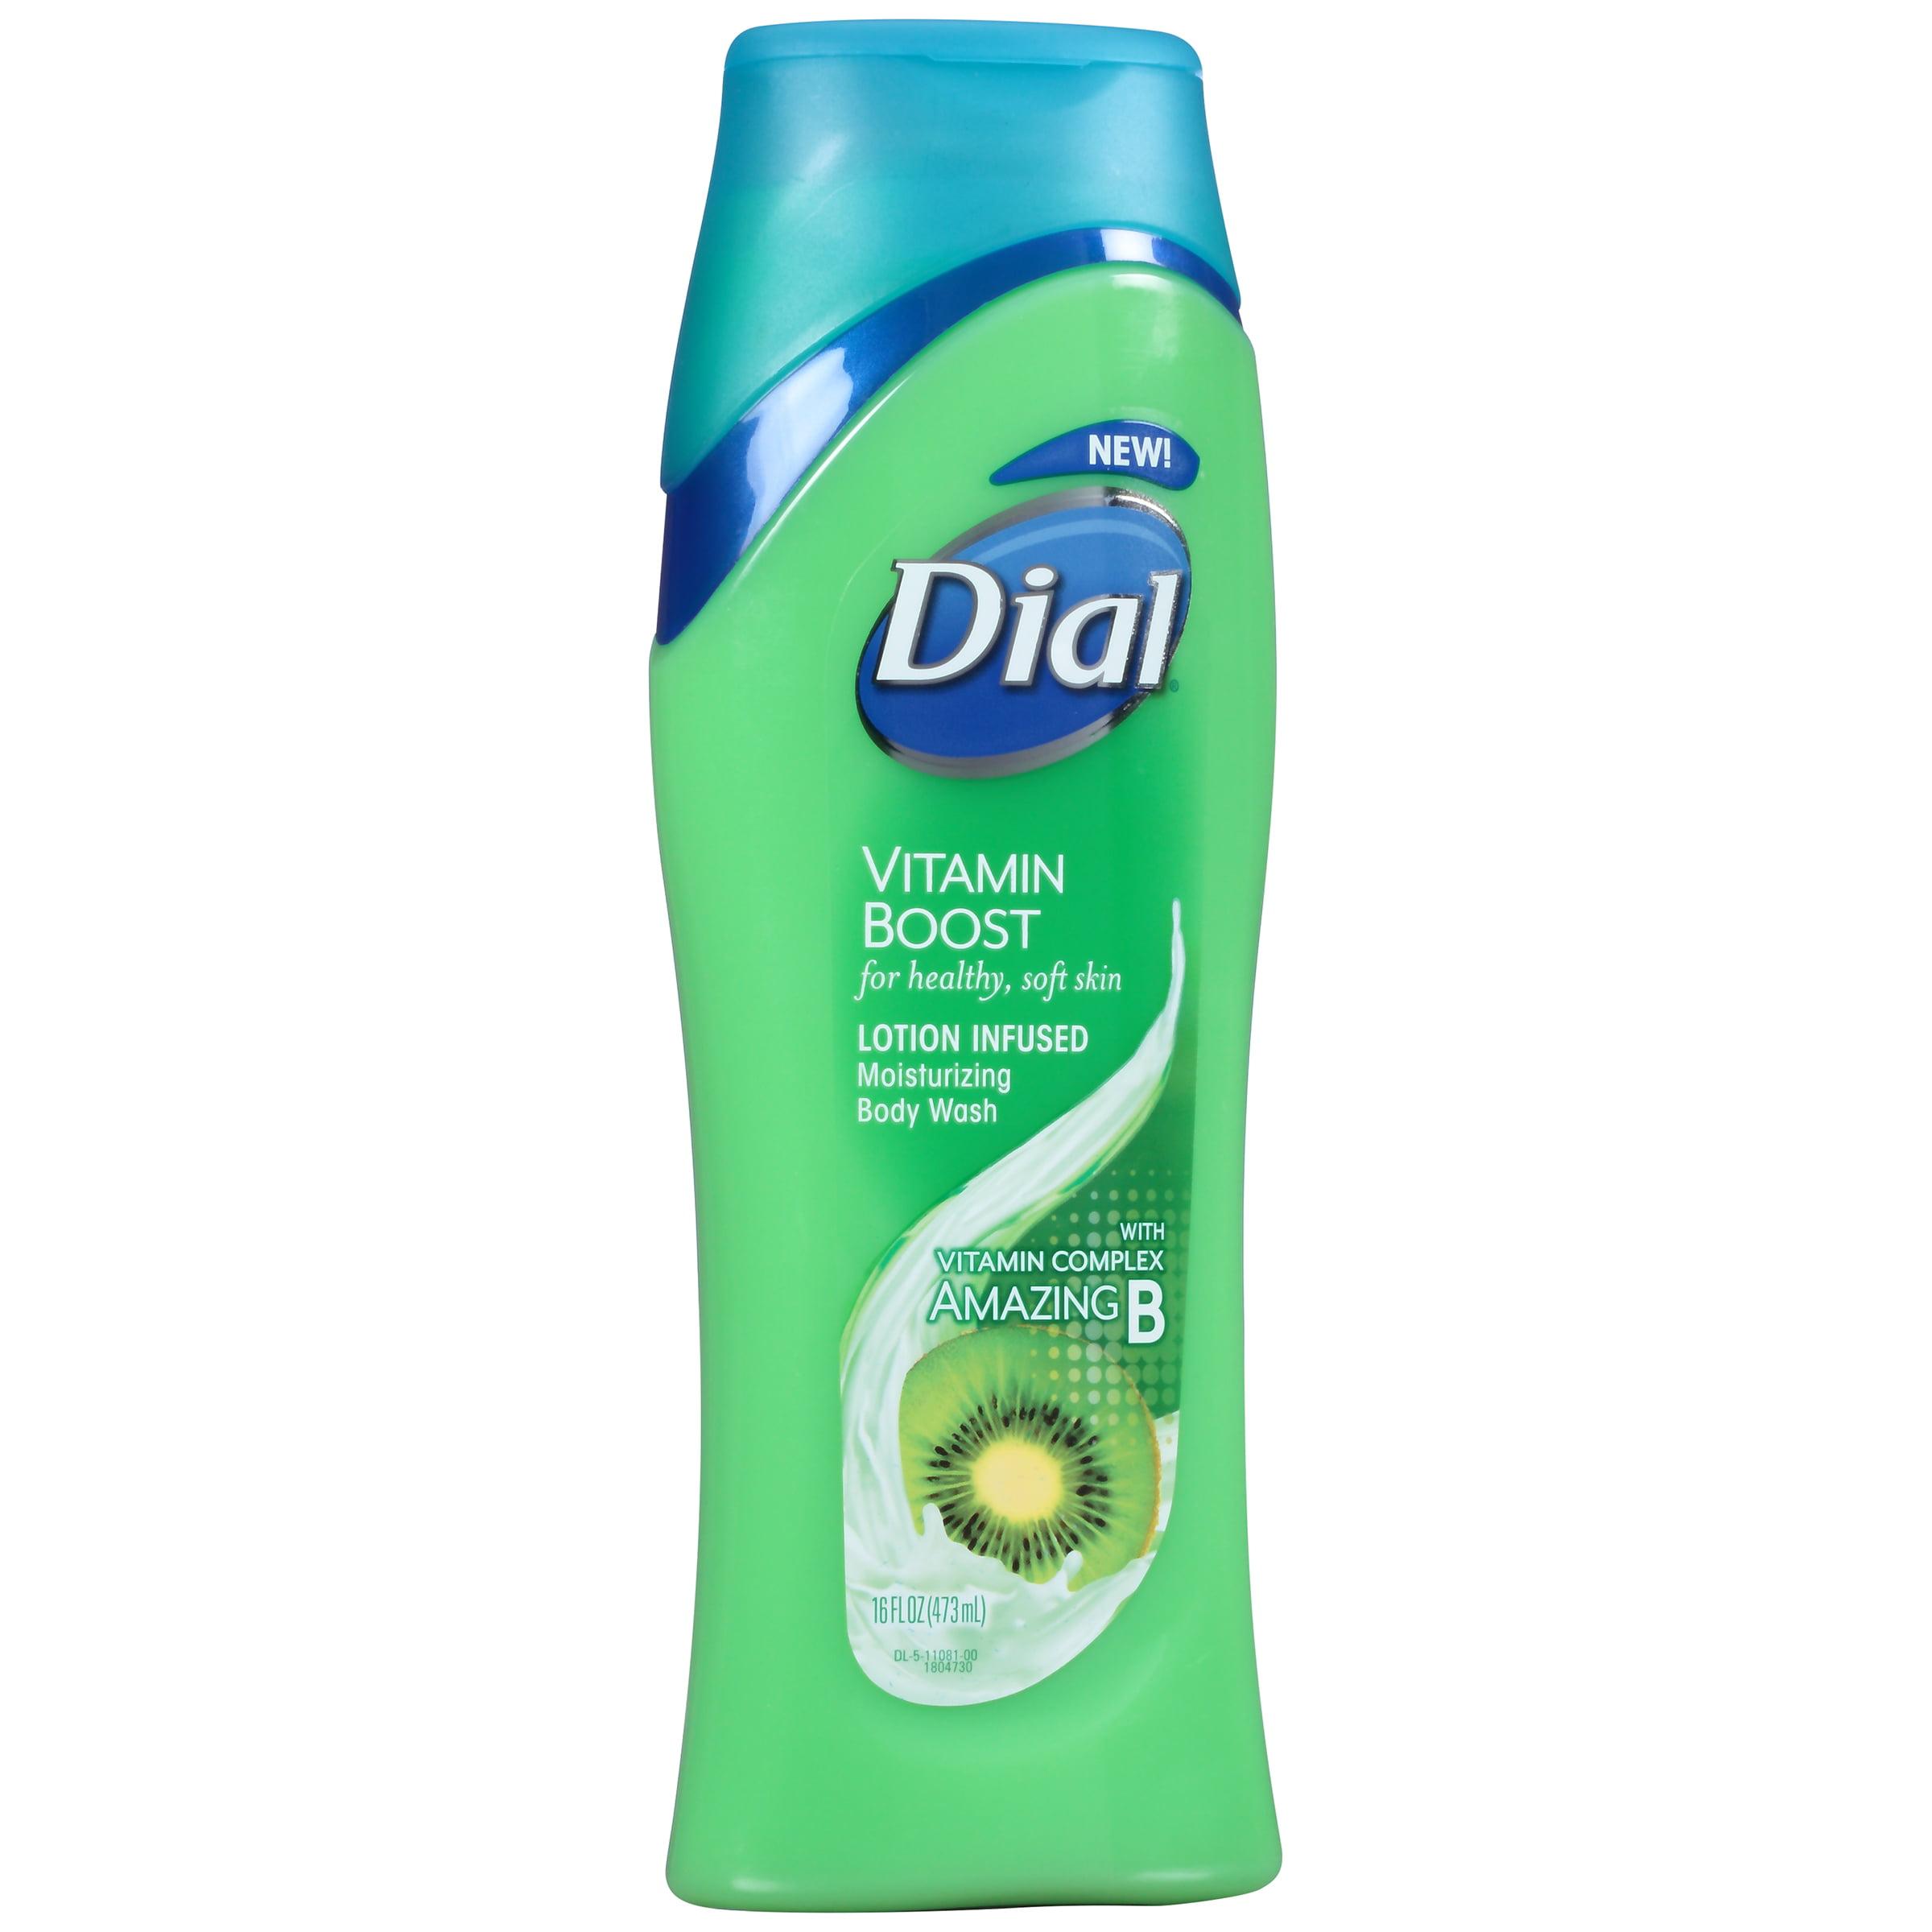 Dial® Vitamin Boost Lotion Infused Moisturizing Body Wash 16 fl. oz. Bottle